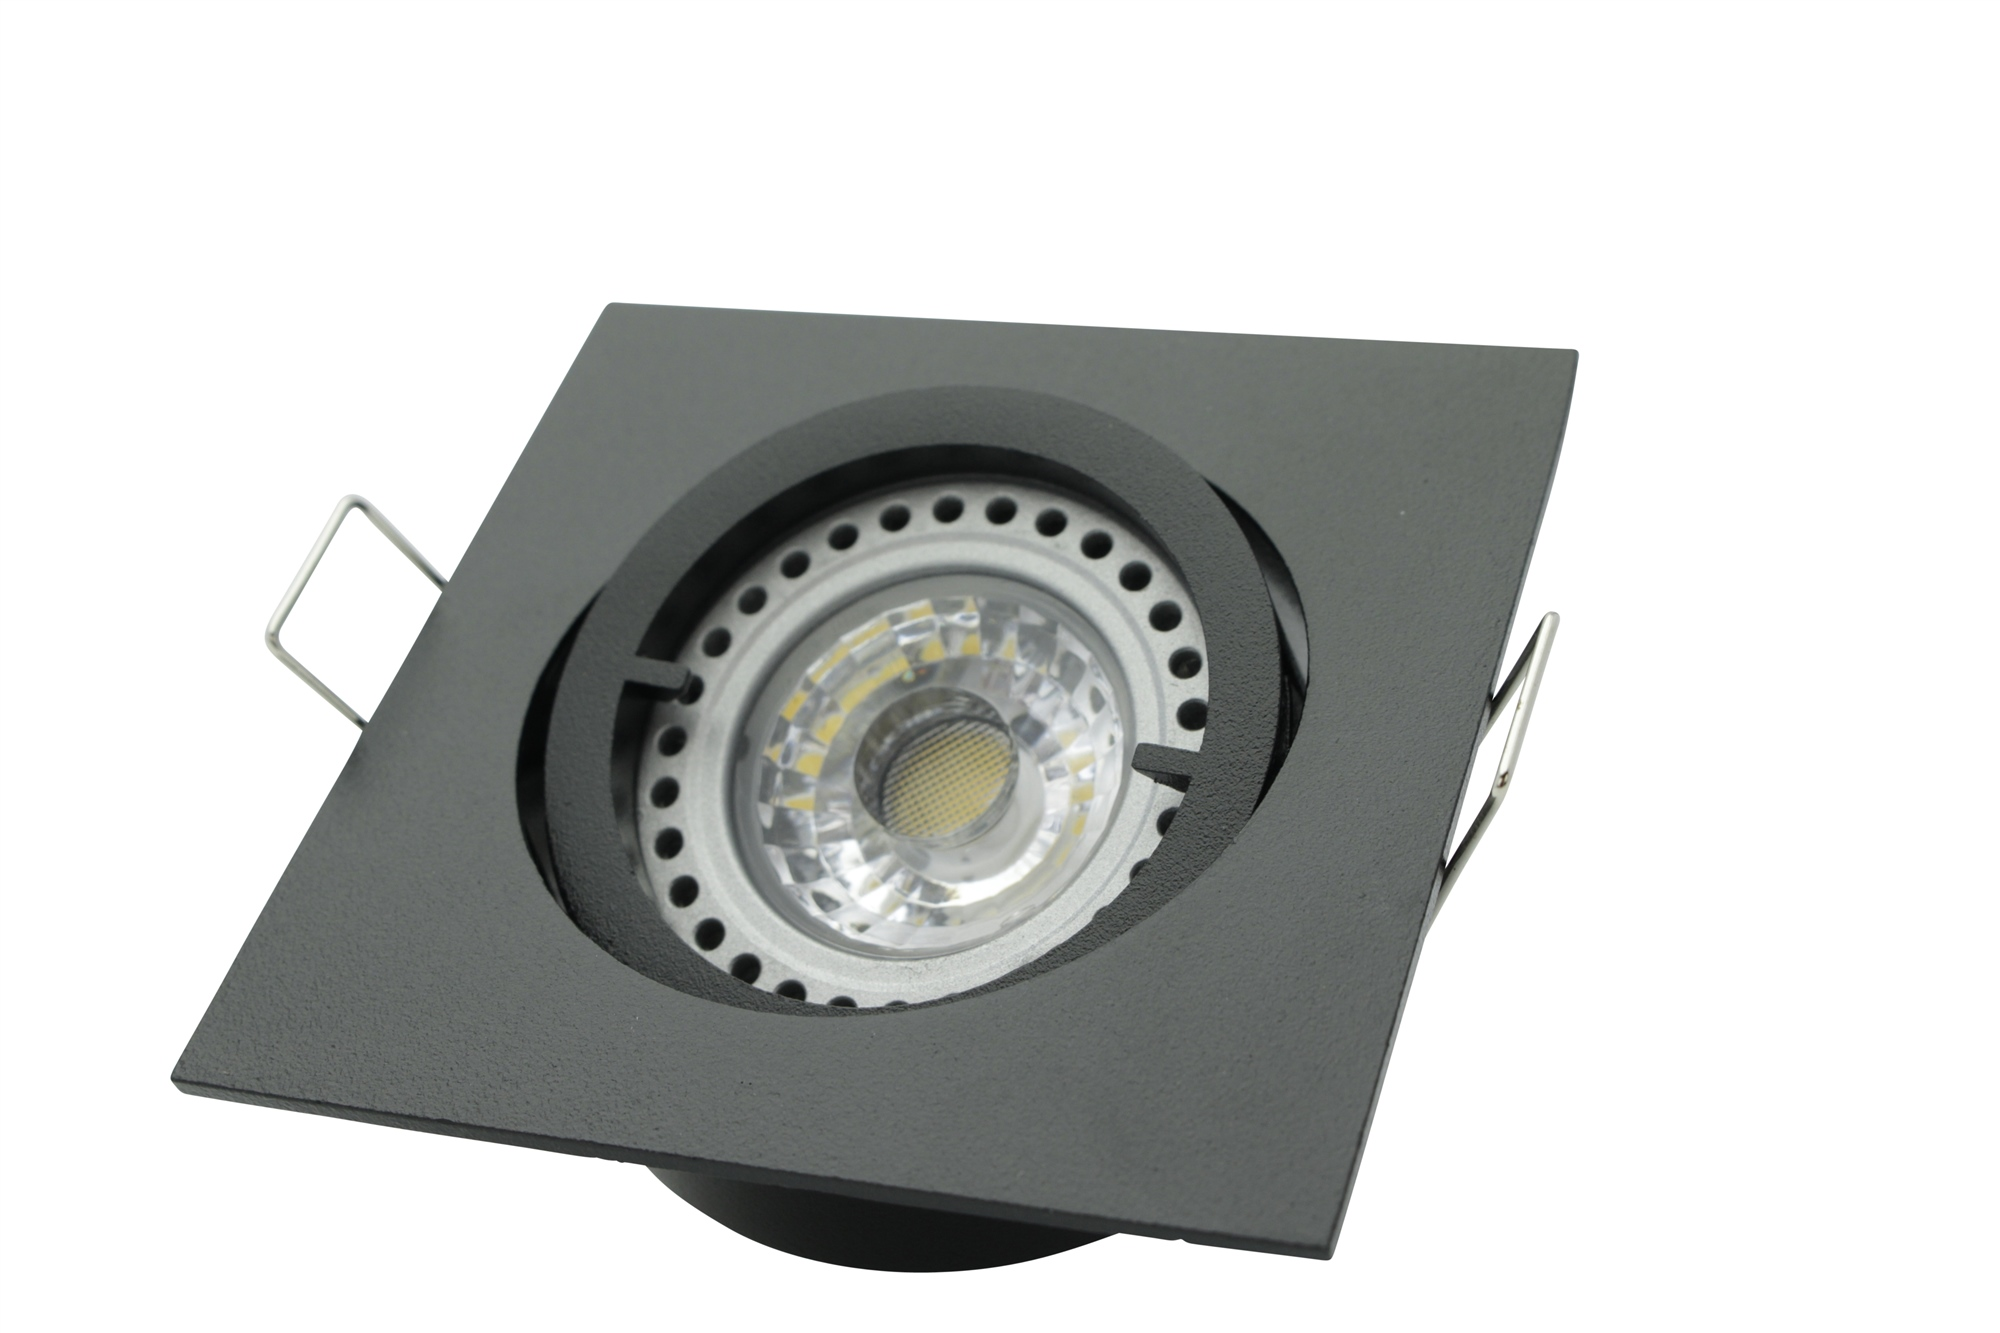 Lampenlux Einbaustrahler Spot Snap eckig schwarz schwenkbar 8.2x8.2cm 230V rostfrei Aluminium